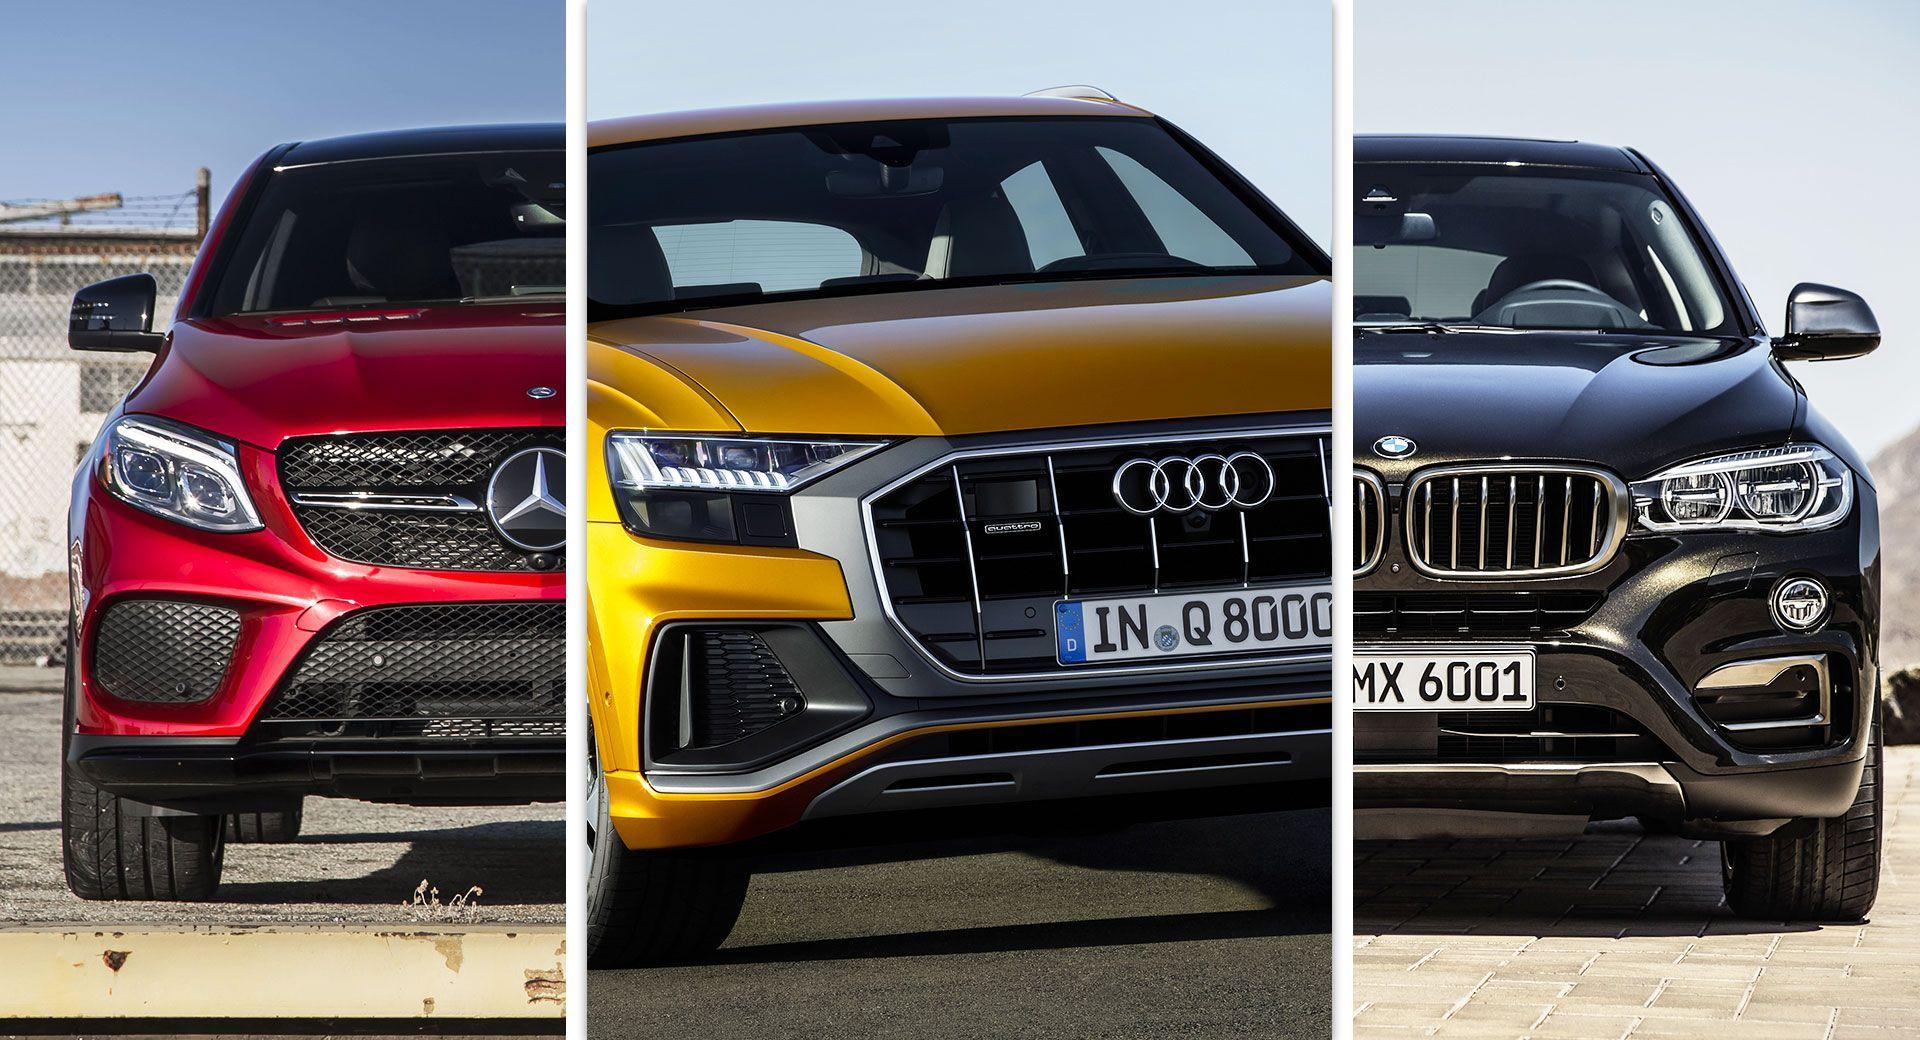 Audi Q8 Vs Bmw X6 Vs Mercedes Benz Gle Coupe What S Your Pick